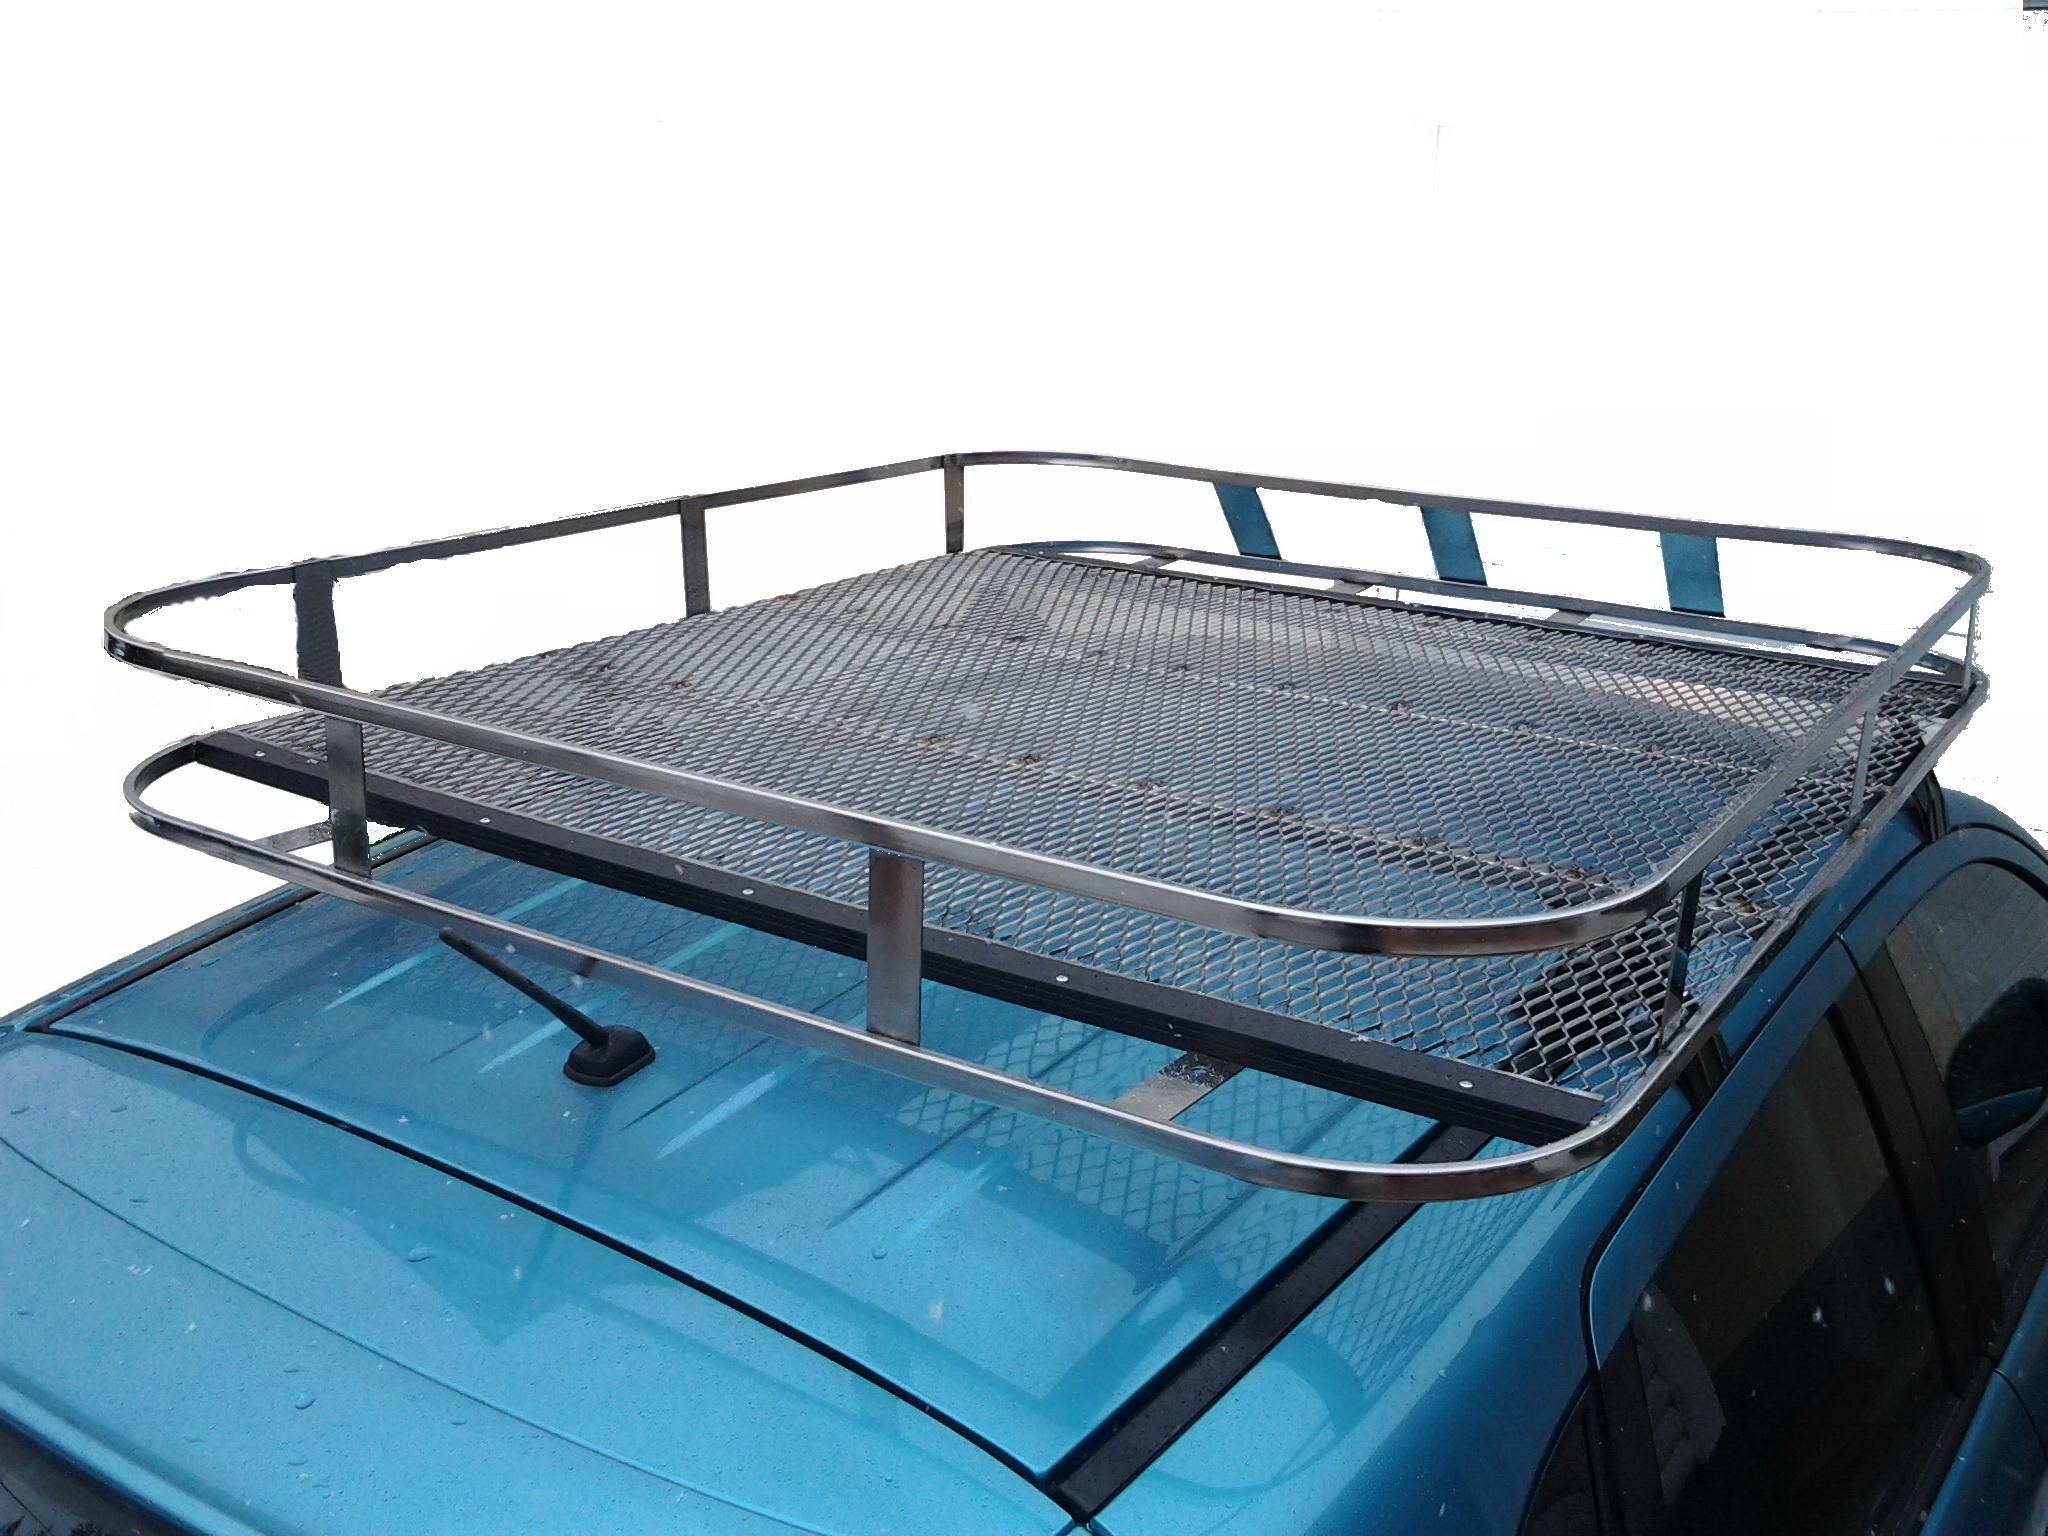 Багажник для автомобиля своими руками